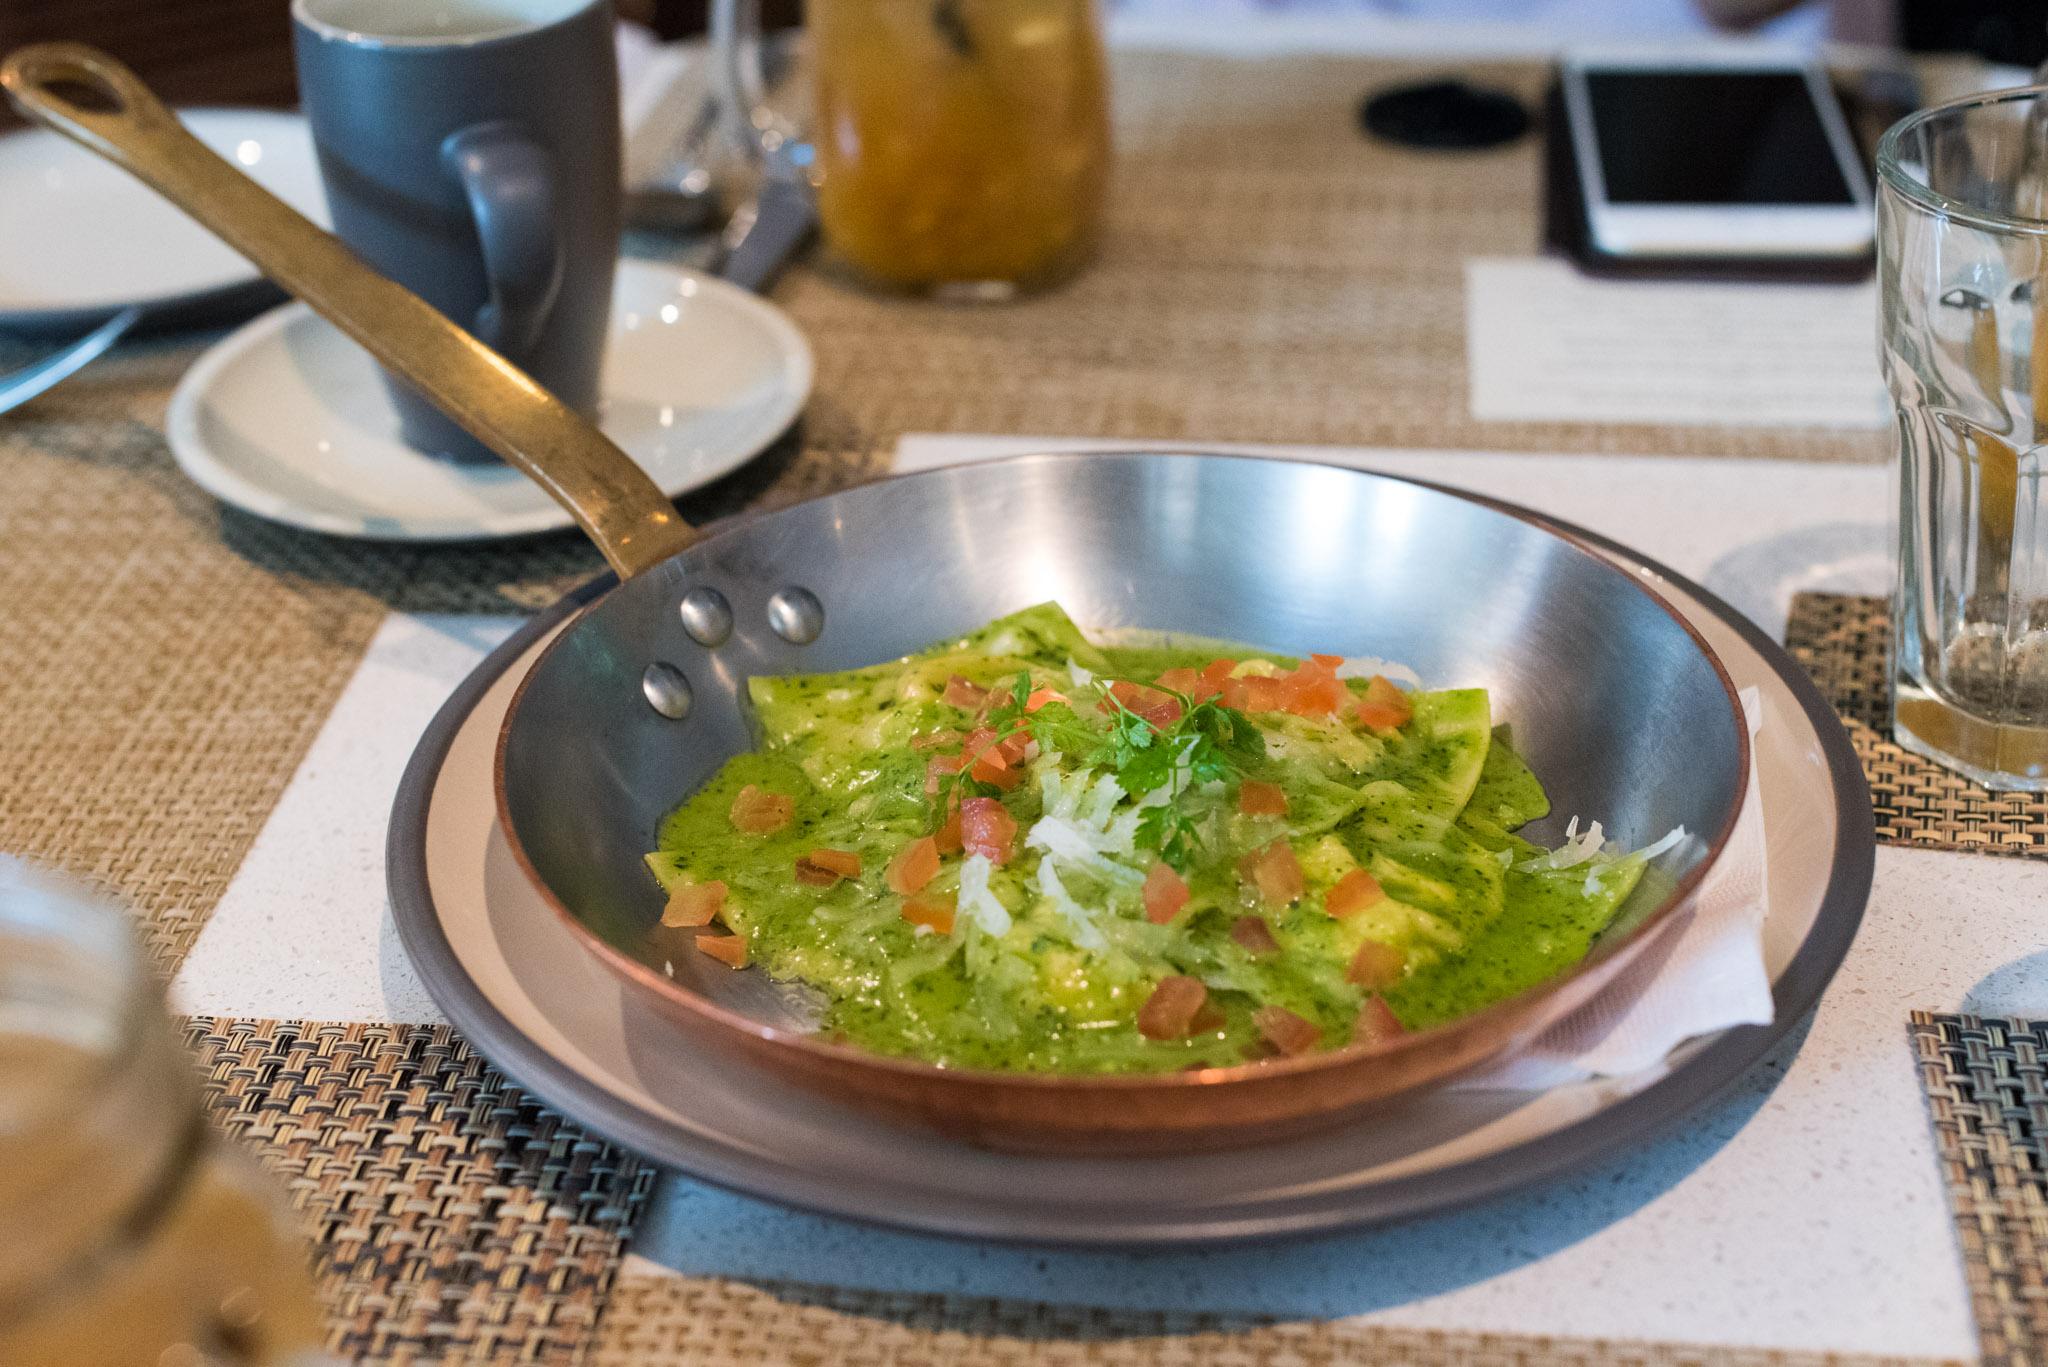 Homemade Ravioli, Sun-dried Tomatoes, Bufala Ricotta in Basil Sauce  The Waterfall - Shangri-La Singapore